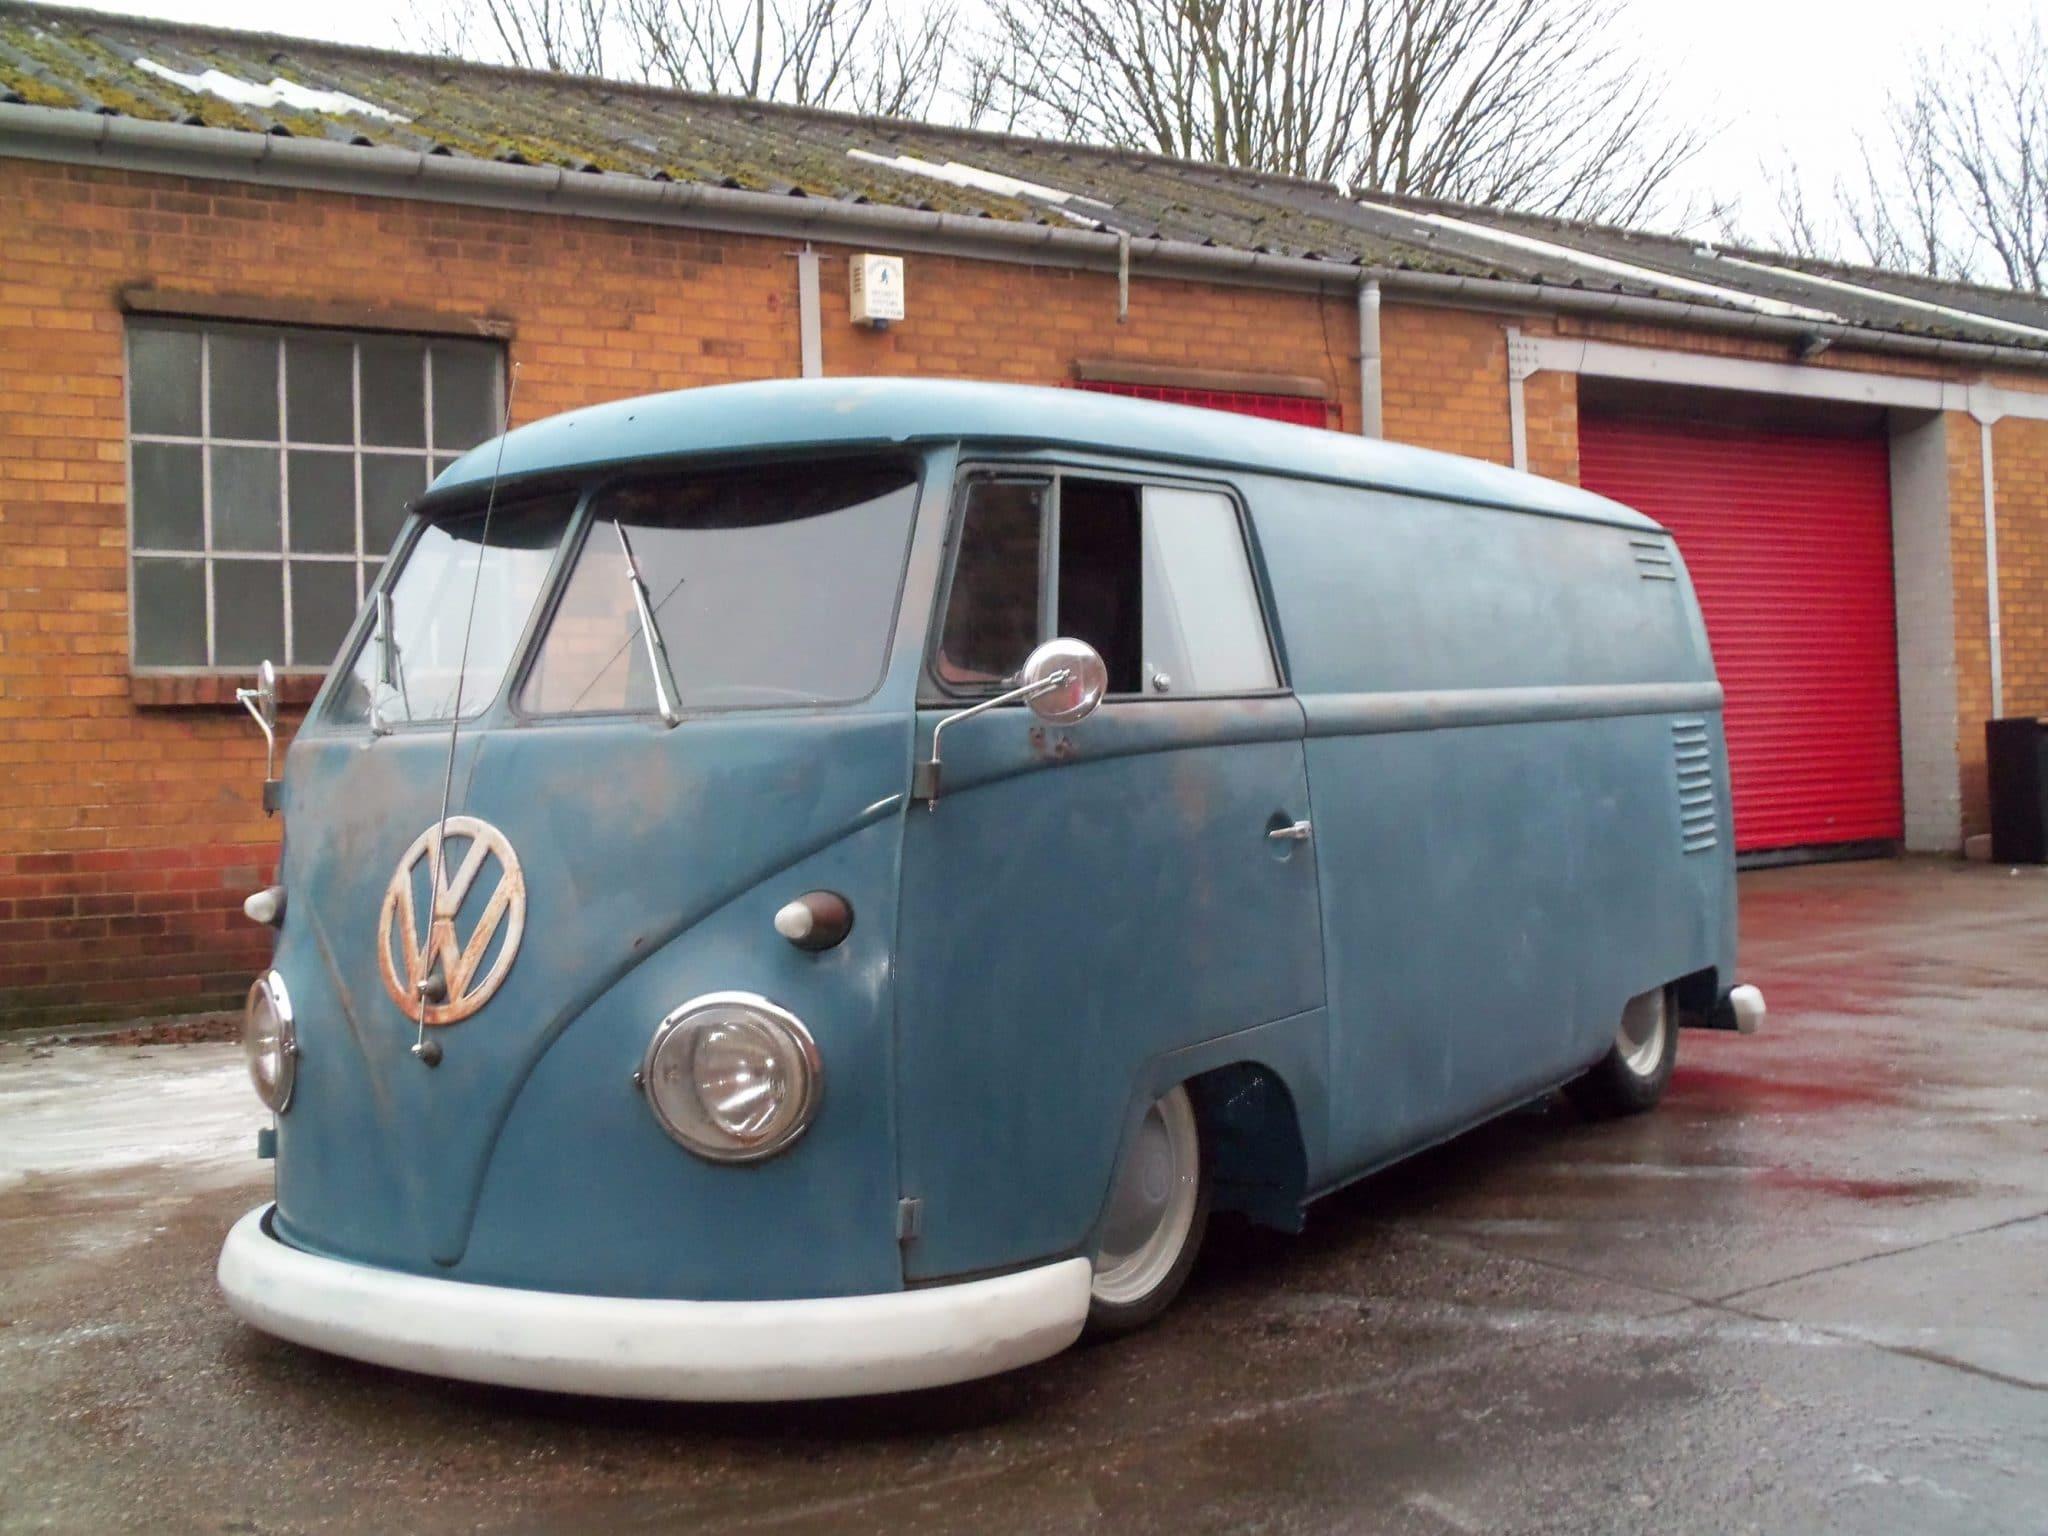 VW camper van before restoration